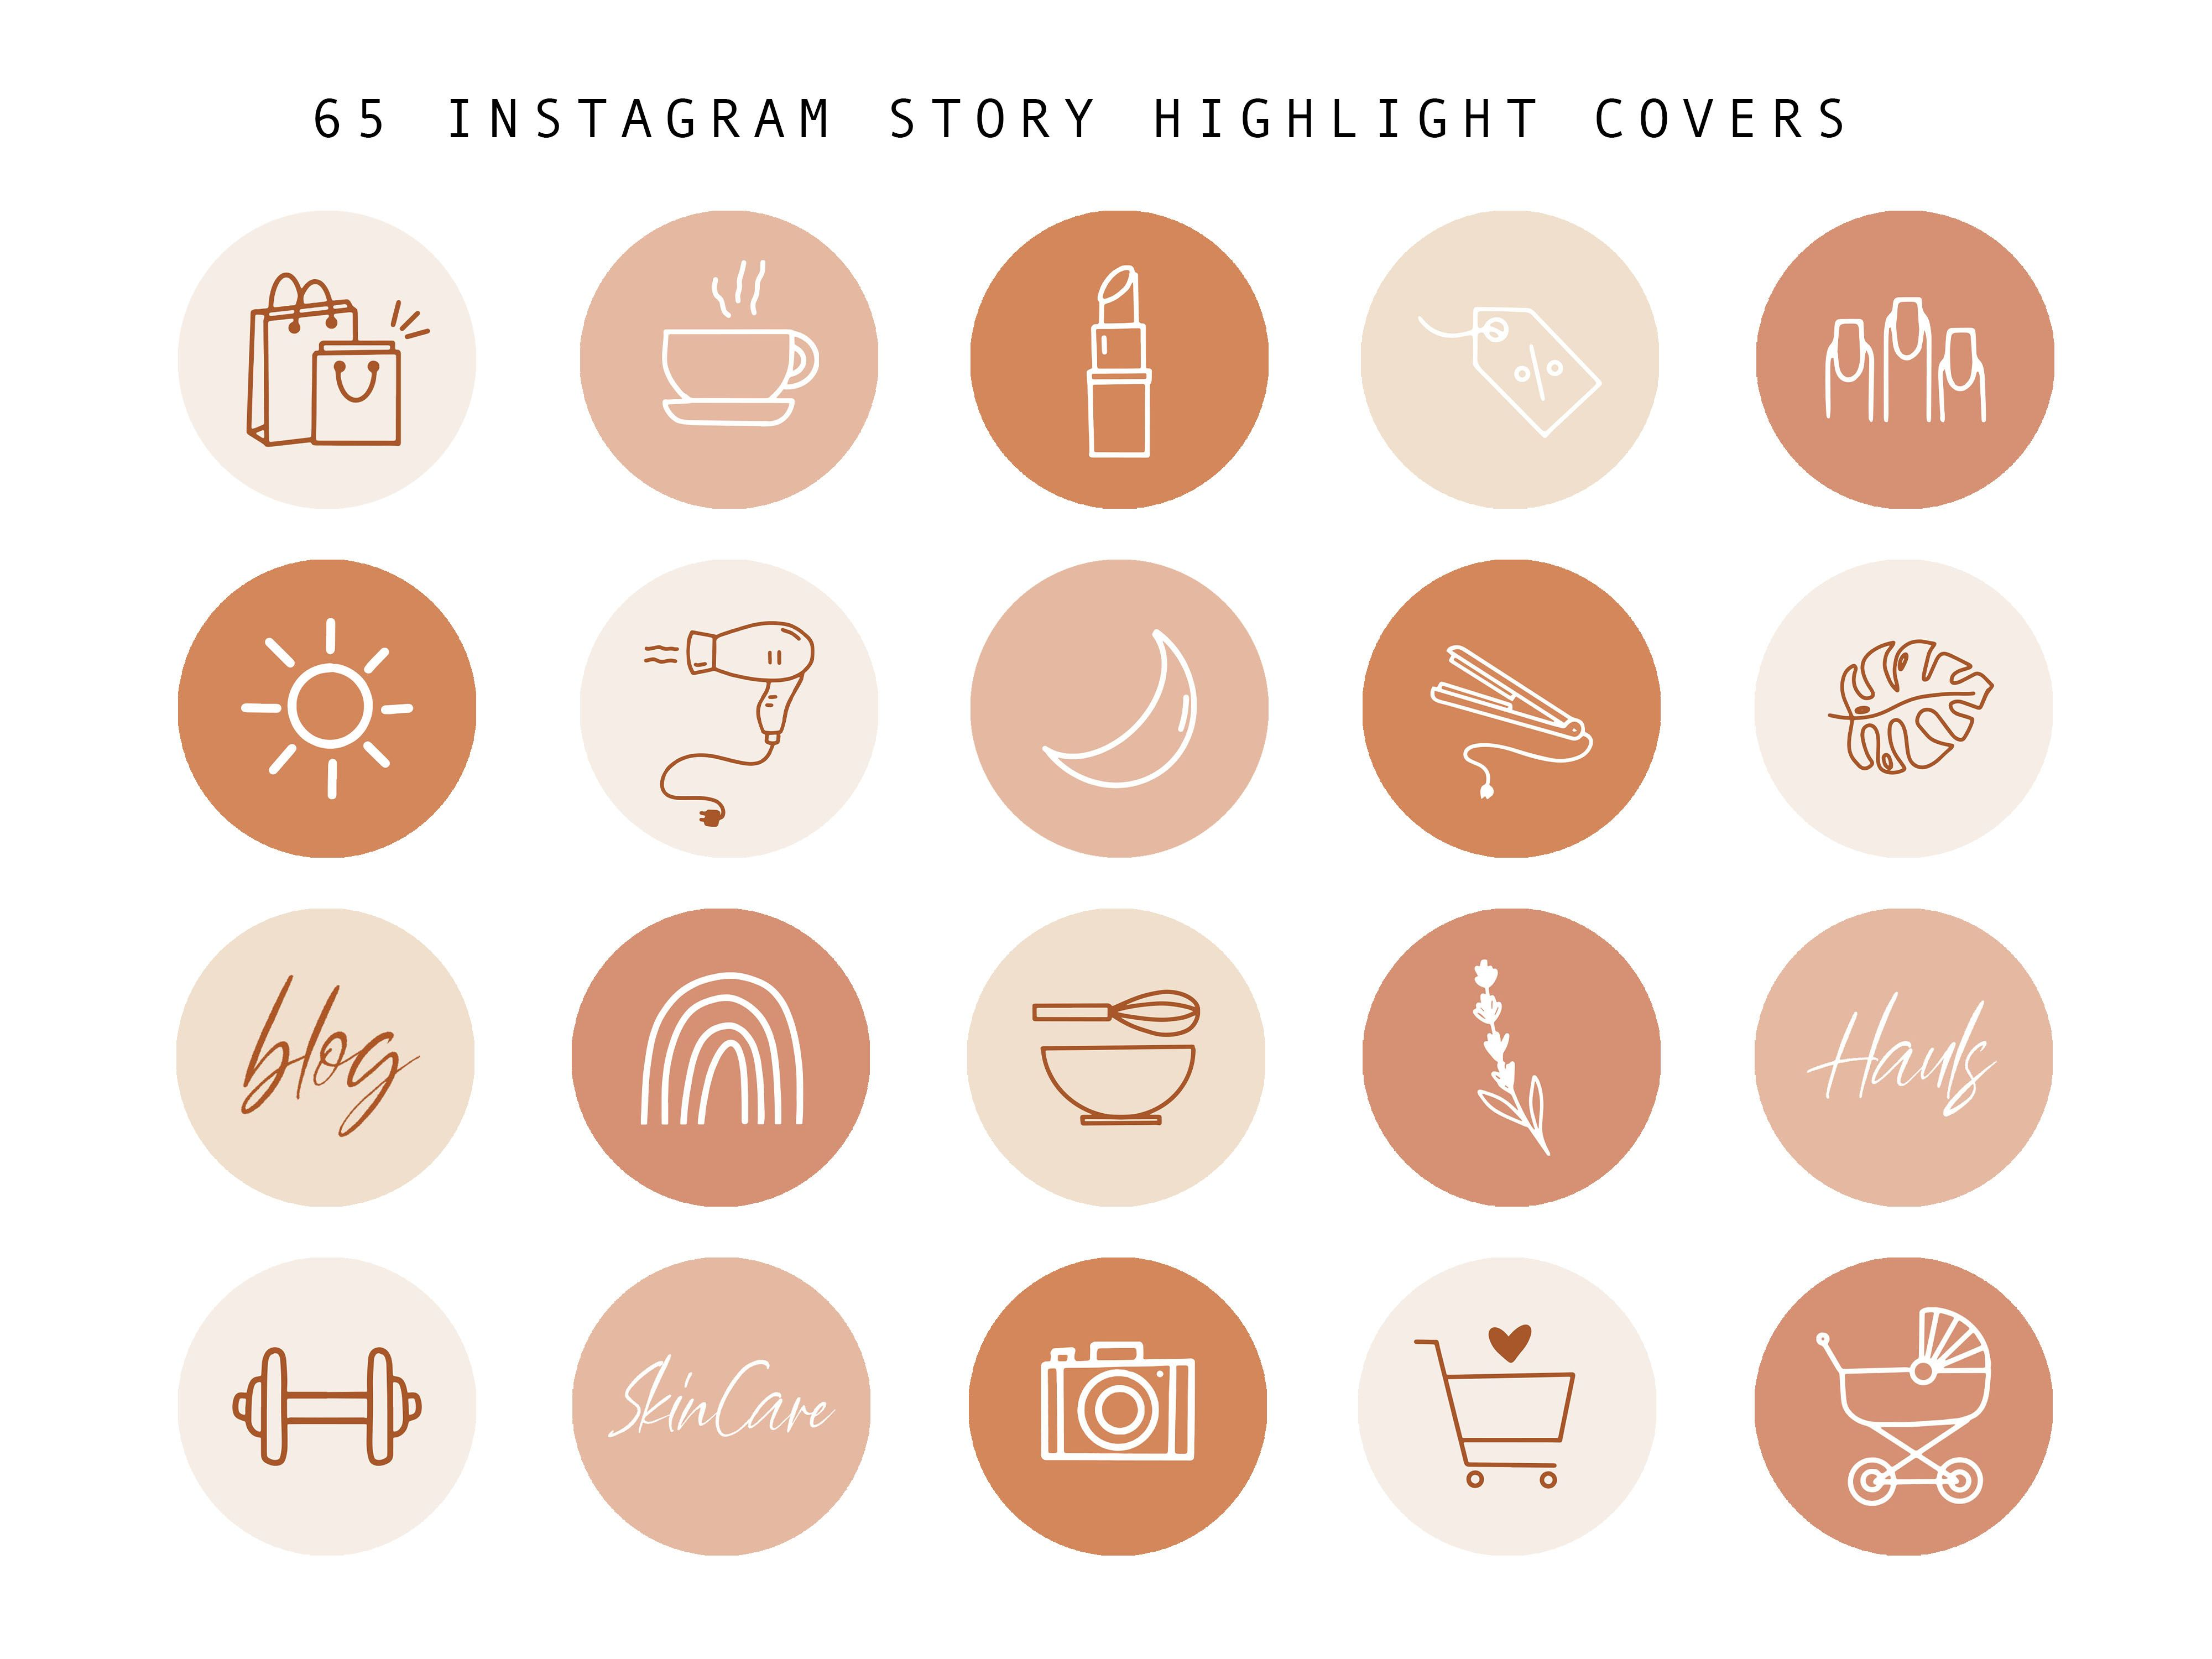 65 Instagram Highlight Cover Icons Instagram Stories Instagram Highlight Instagram Cover Story Highlight Covers Highlight Icons In 2020 Instagram Highlight Icons Instagram Aesthetic Instagram Icons